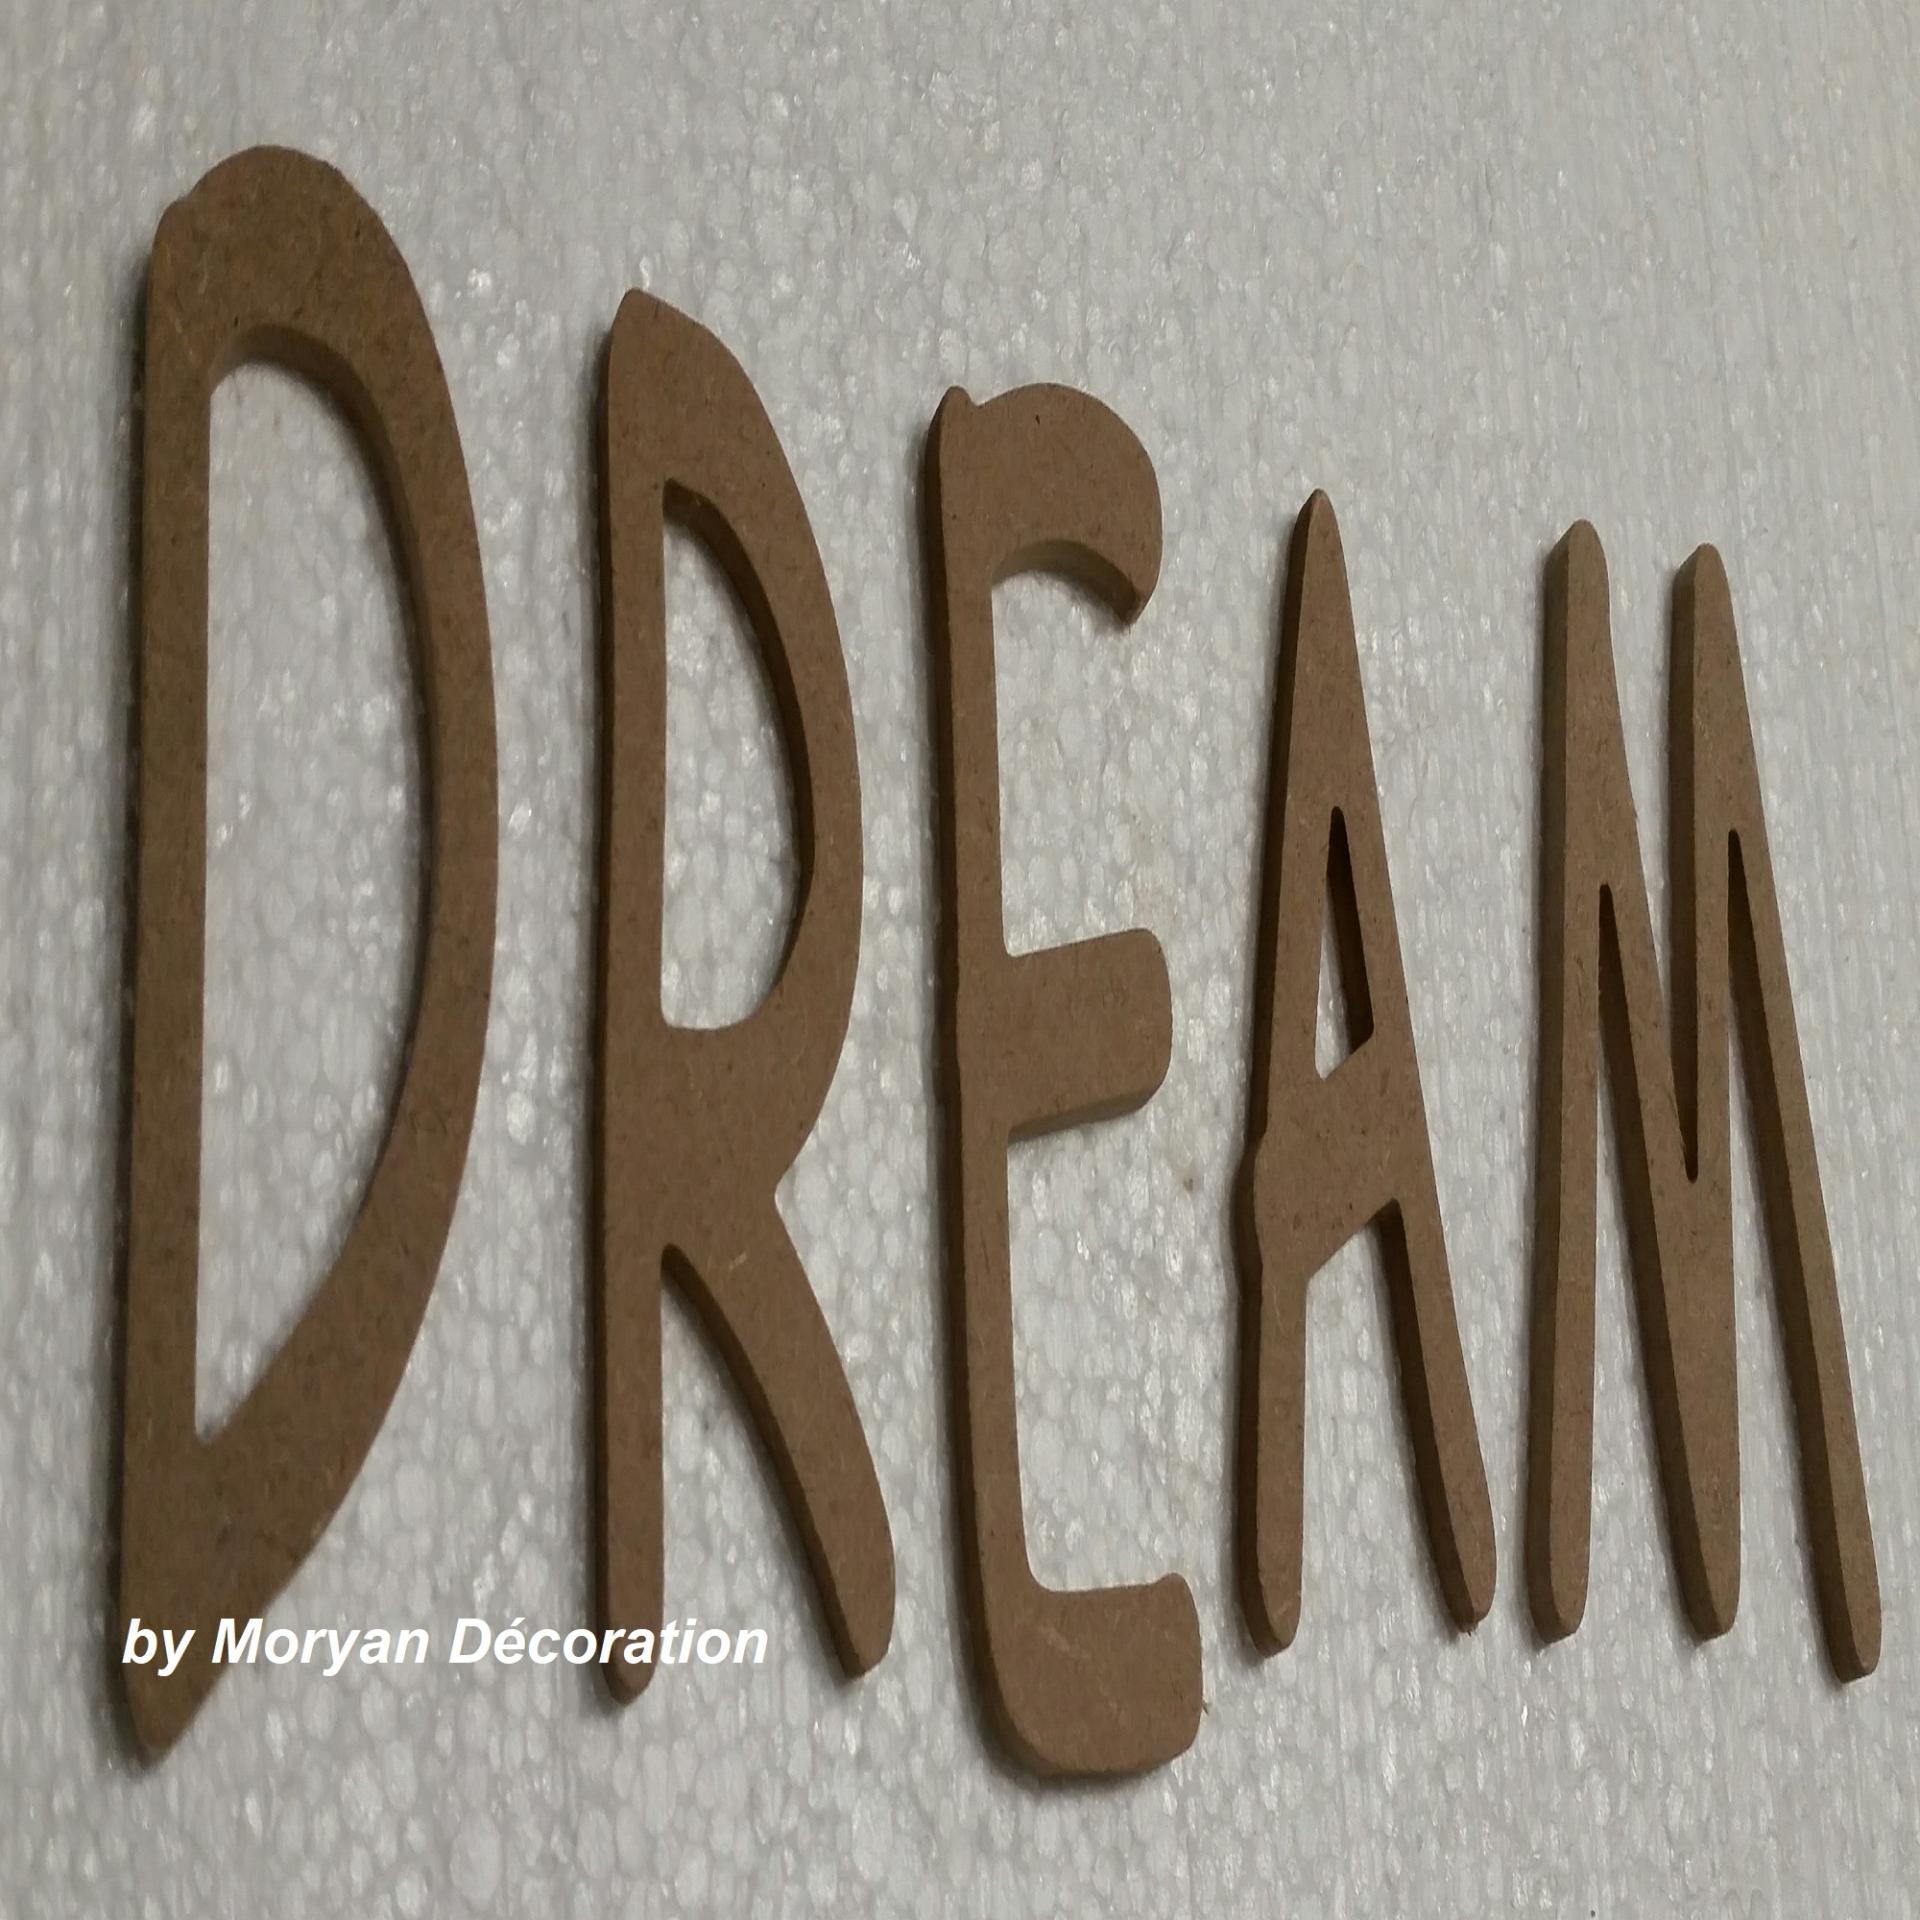 Lettre en bois dream 50 cm